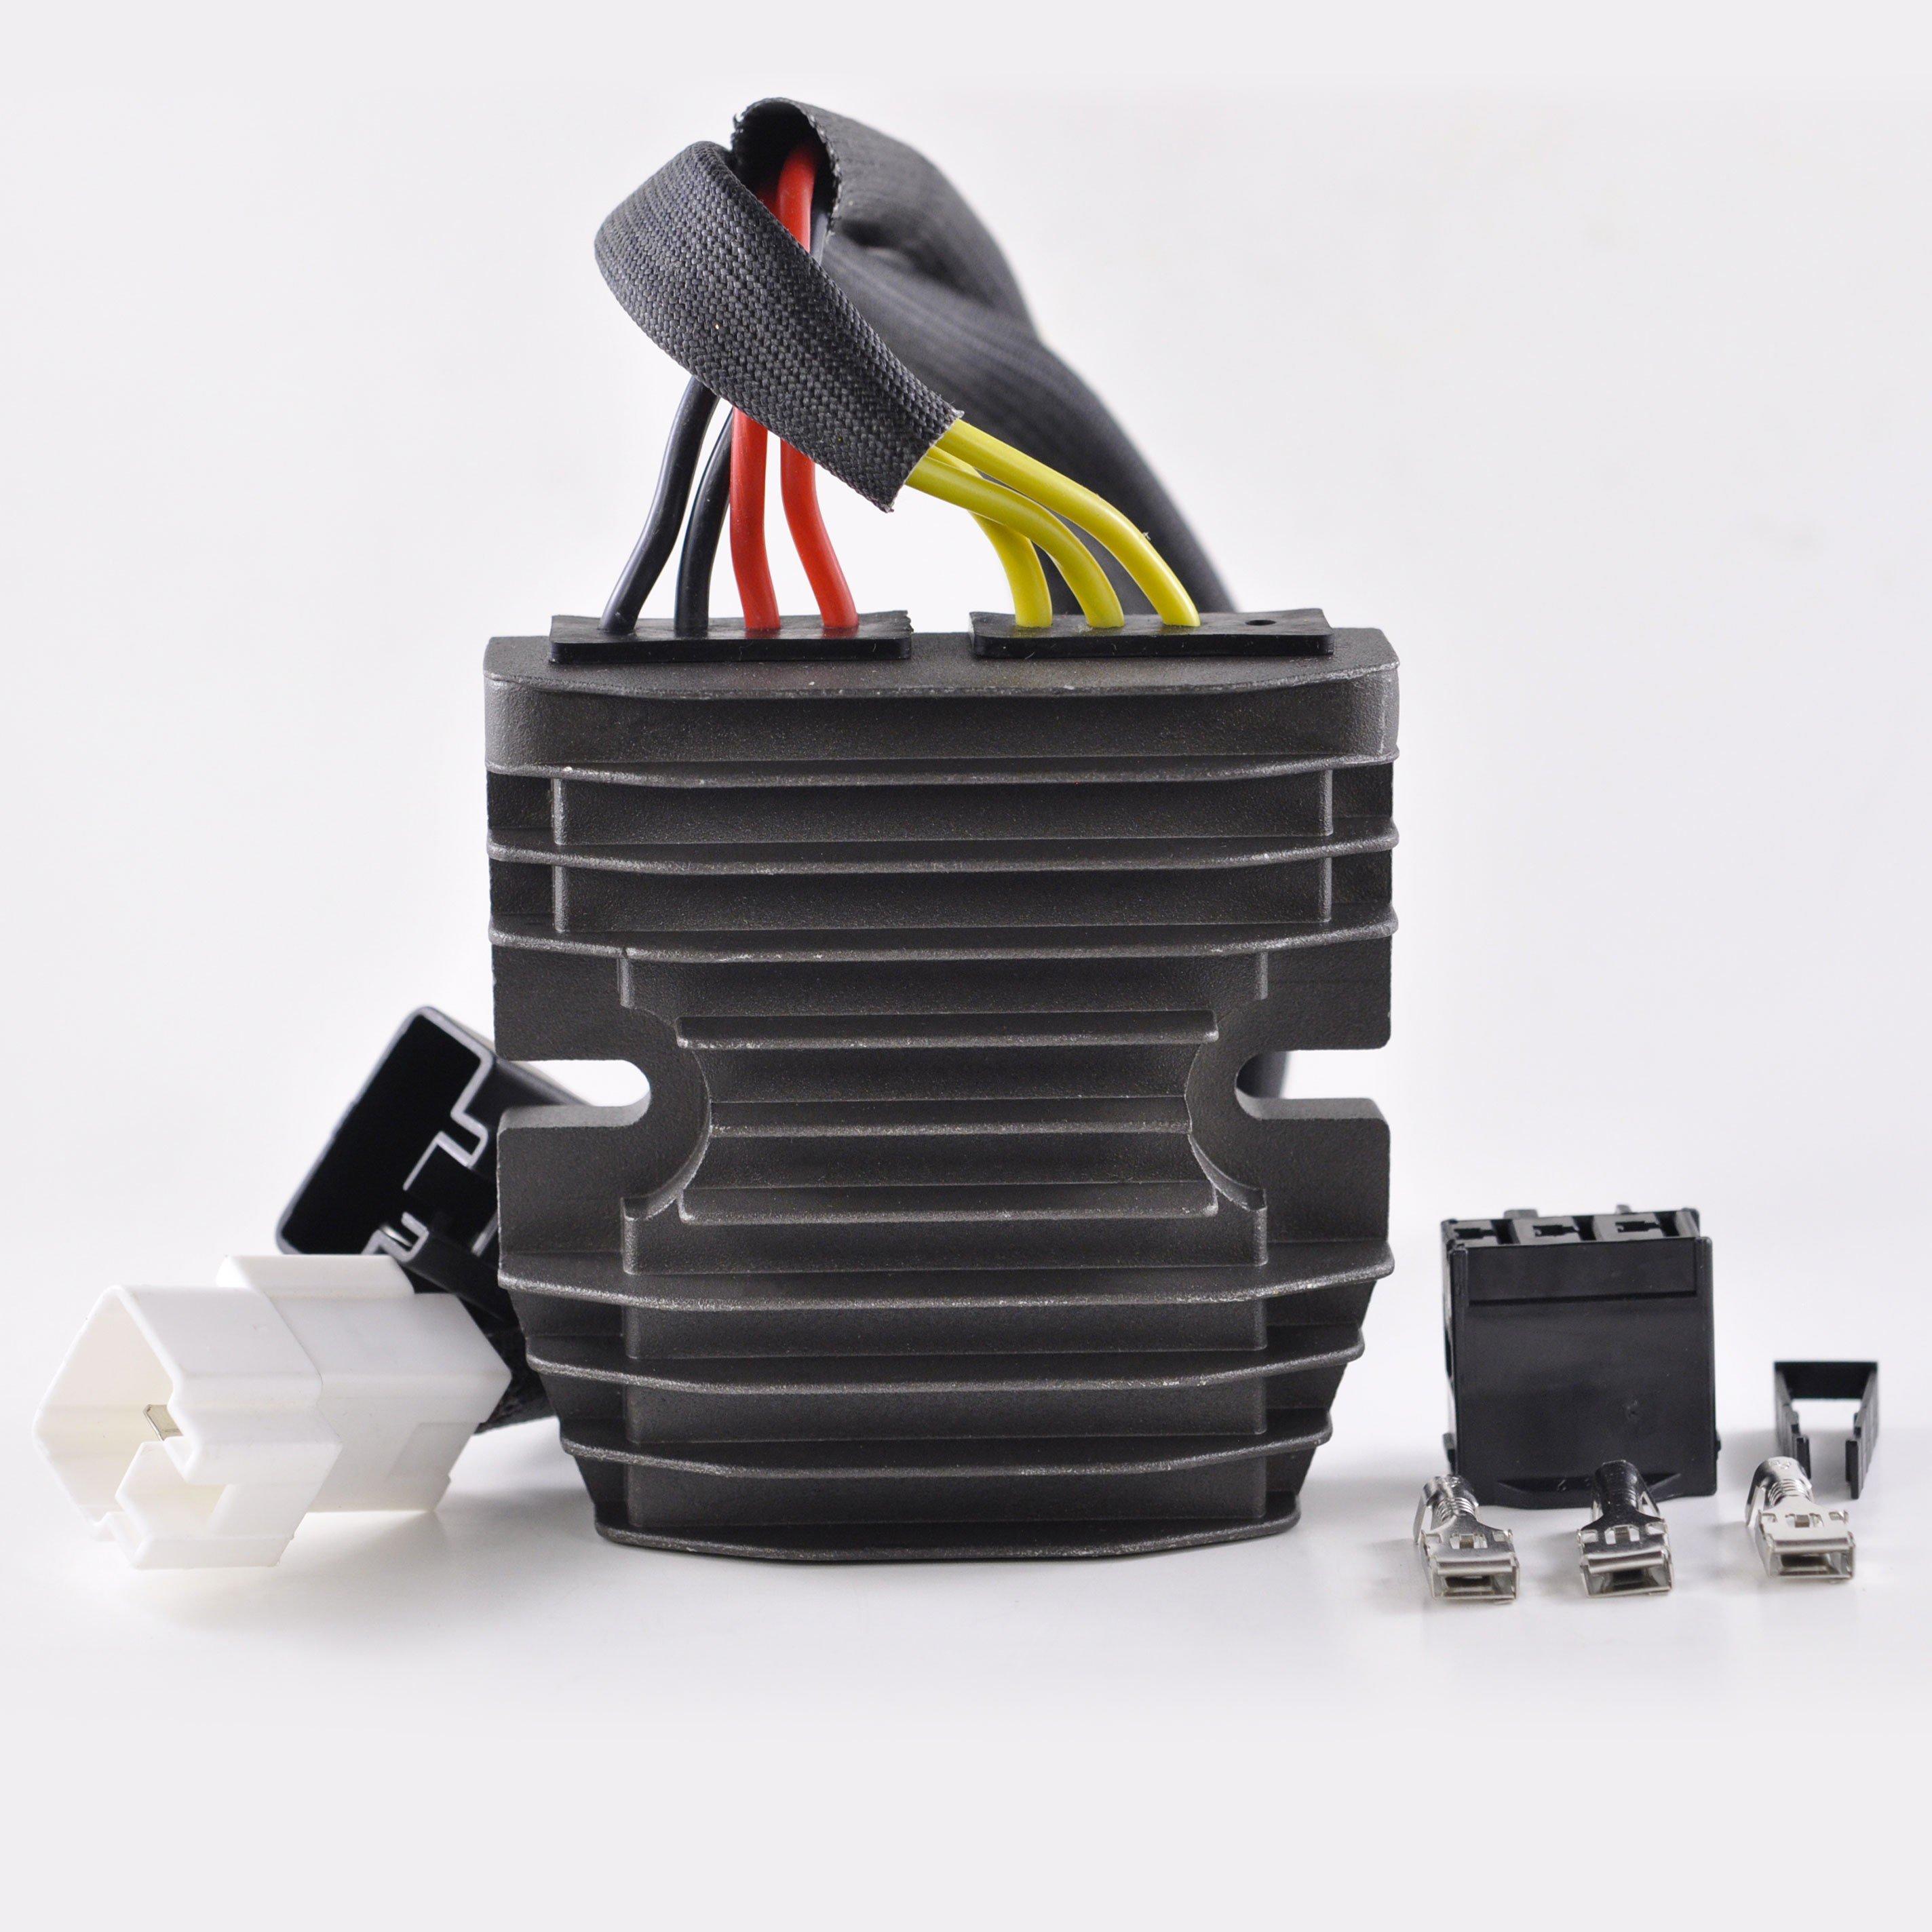 Mosfet Regulator Rectifier Honda Vt 1300 Cr Stateline Cs Sabre Wiring